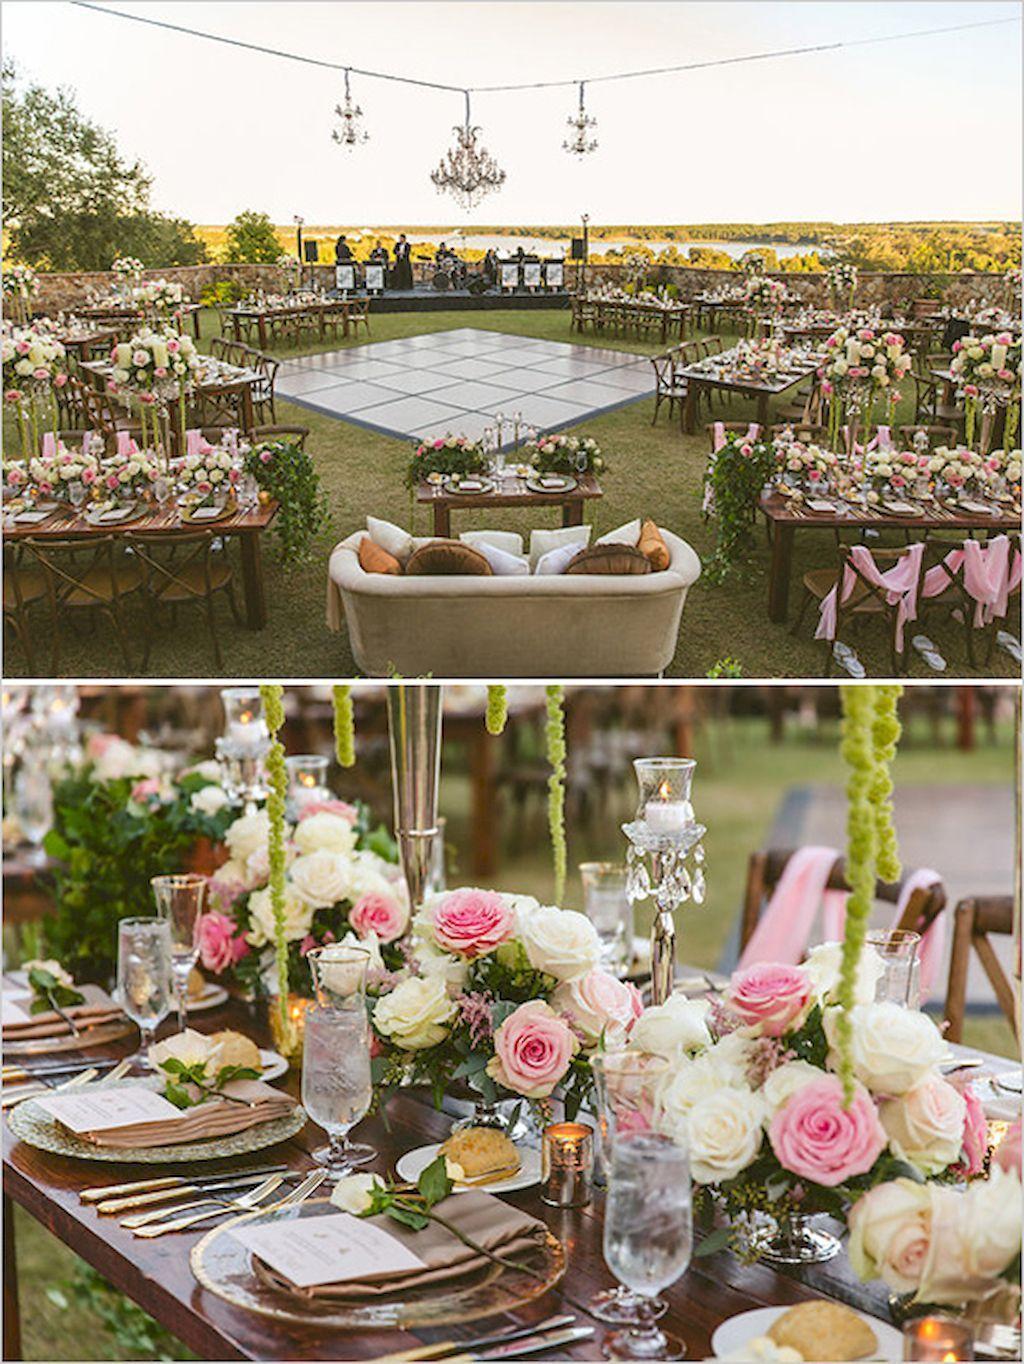 Elegant outdoor wedding decor ideas on a budget (29 ...